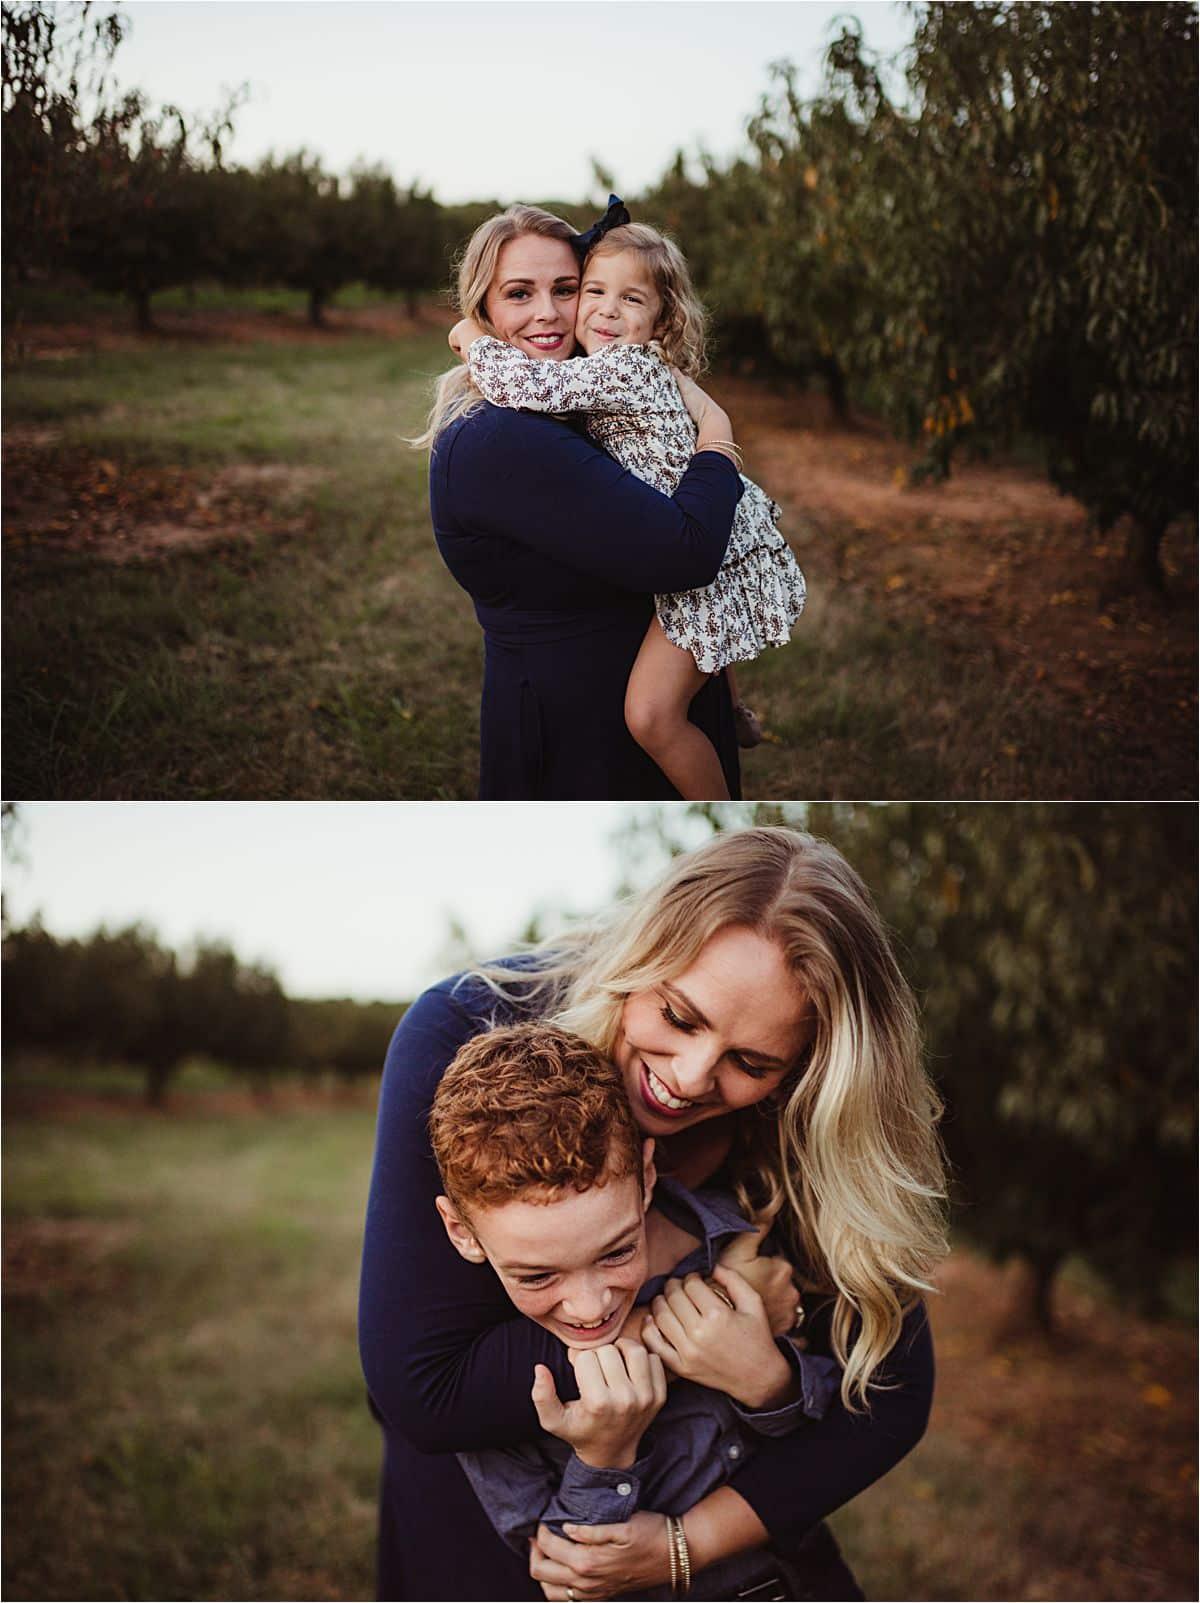 Mom Hugging Kids